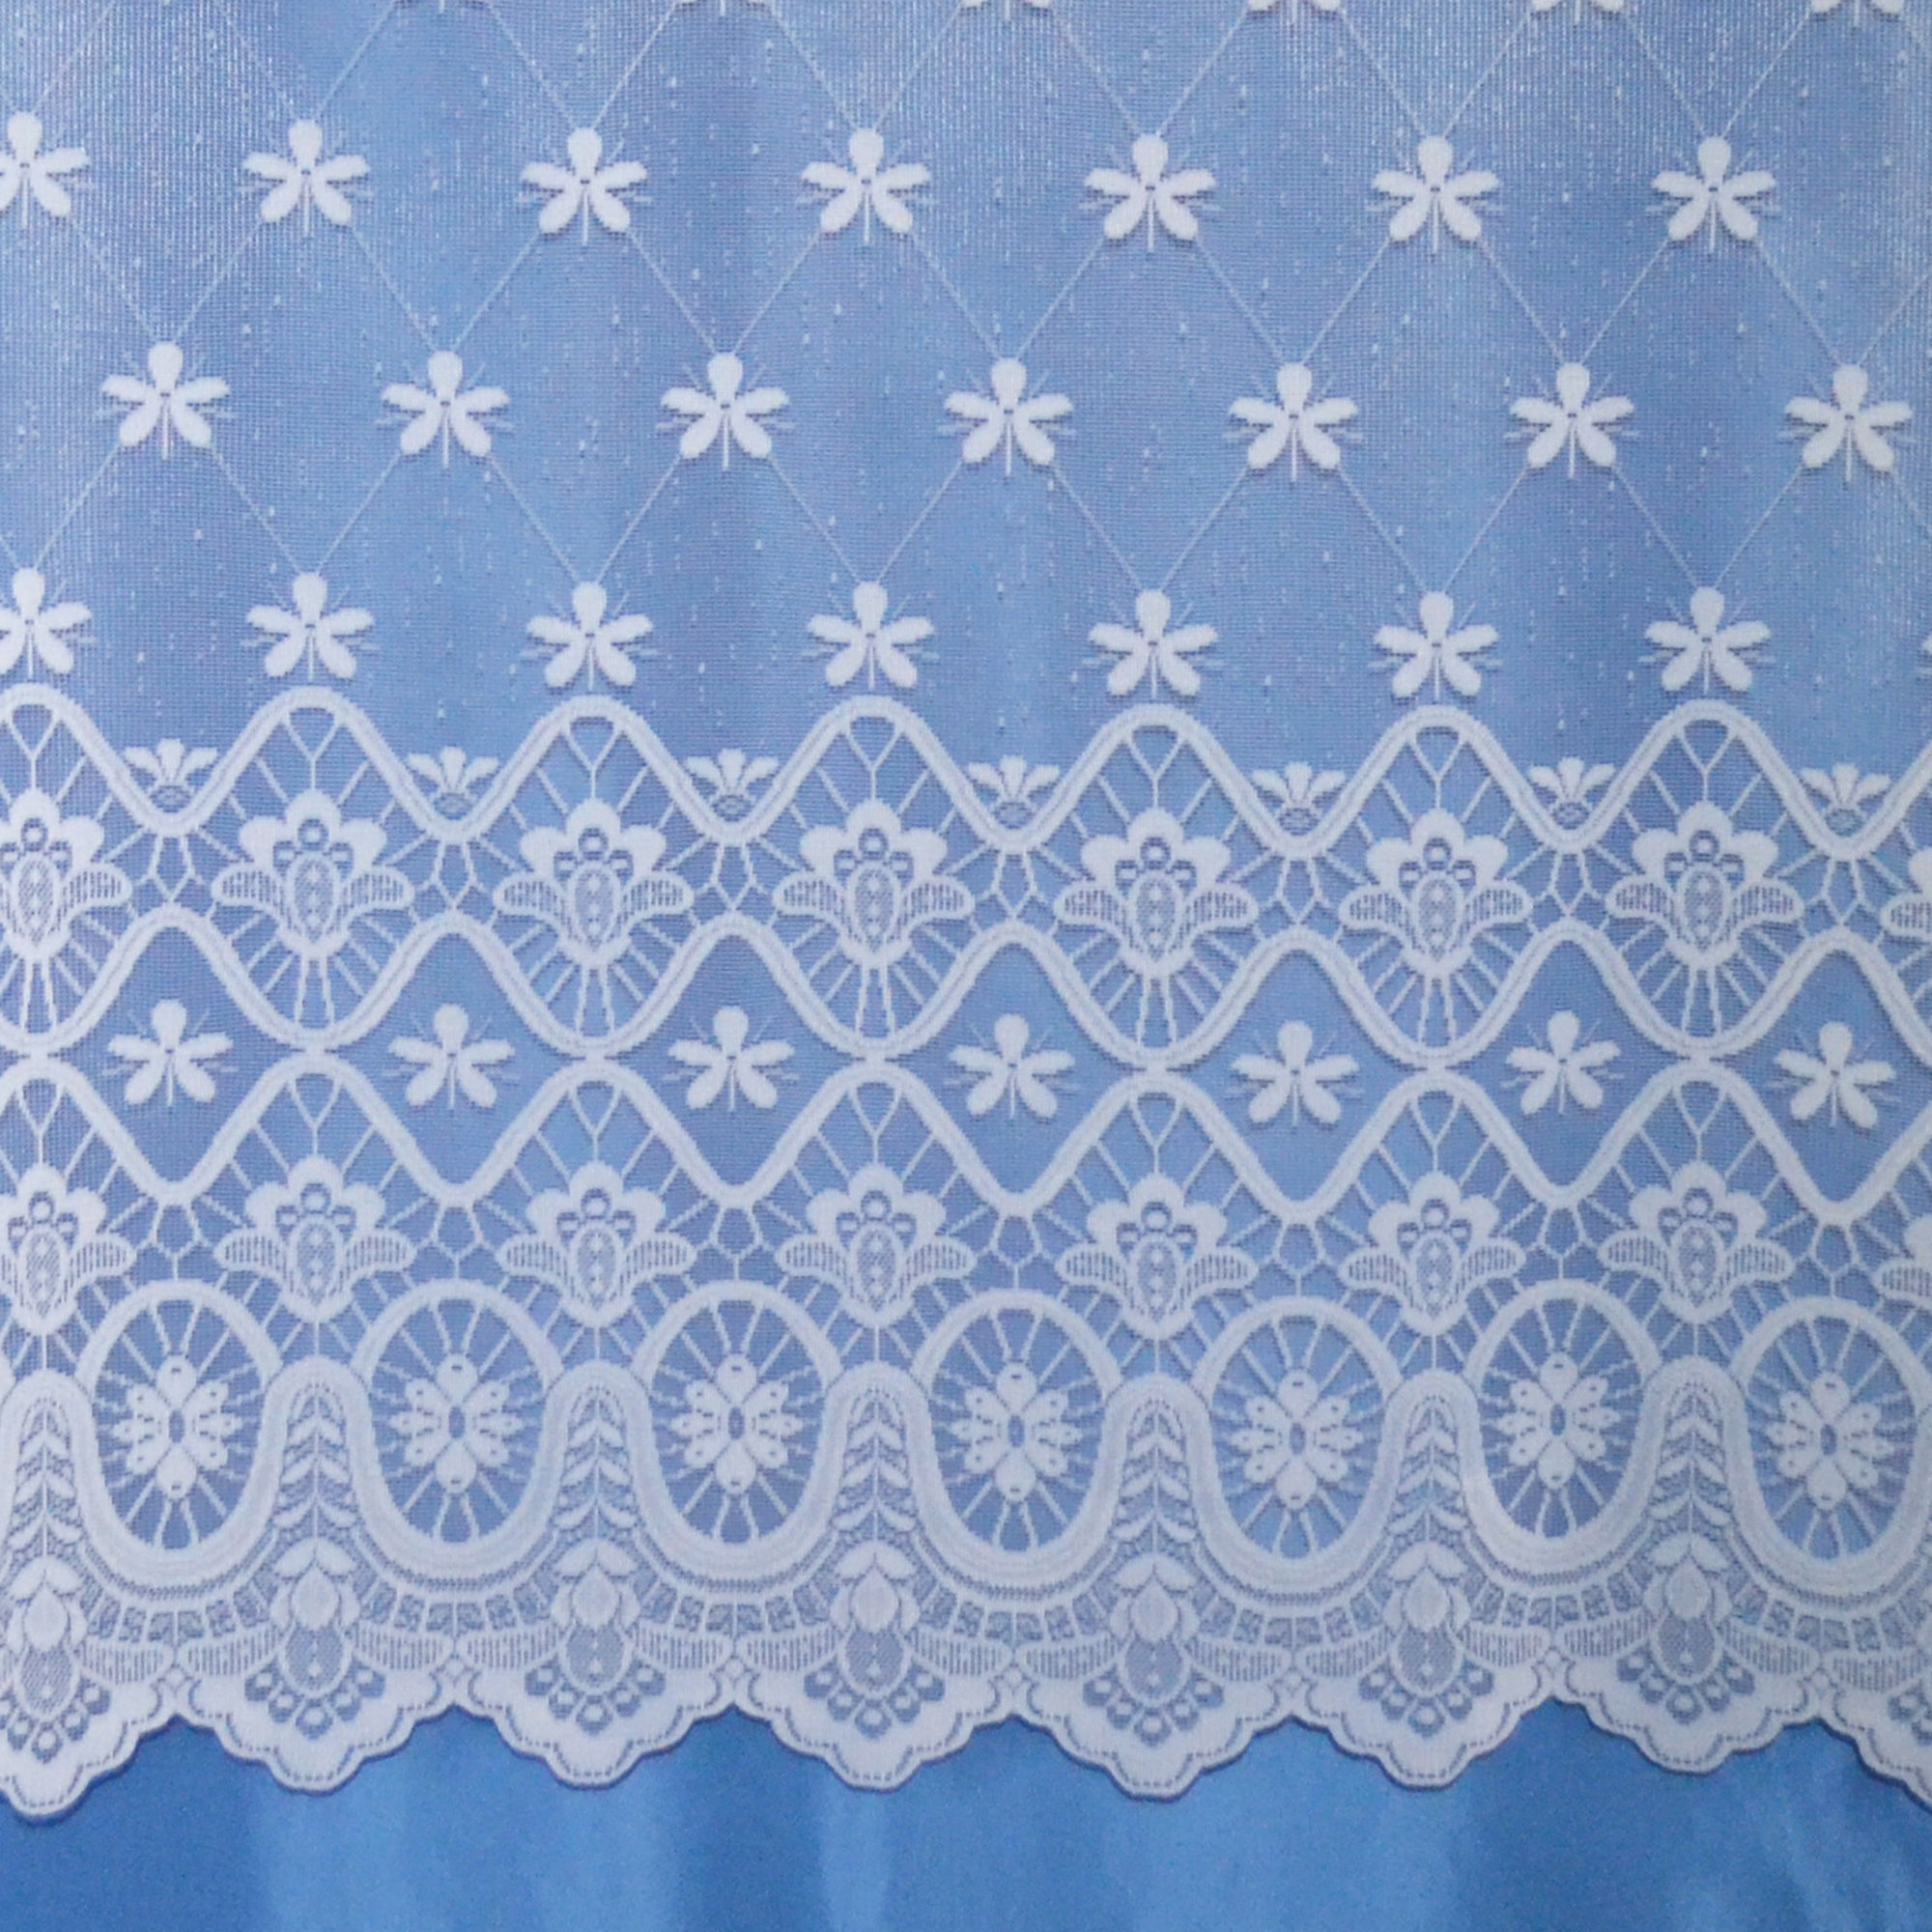 Kempton Brise Bise White Net Fabric